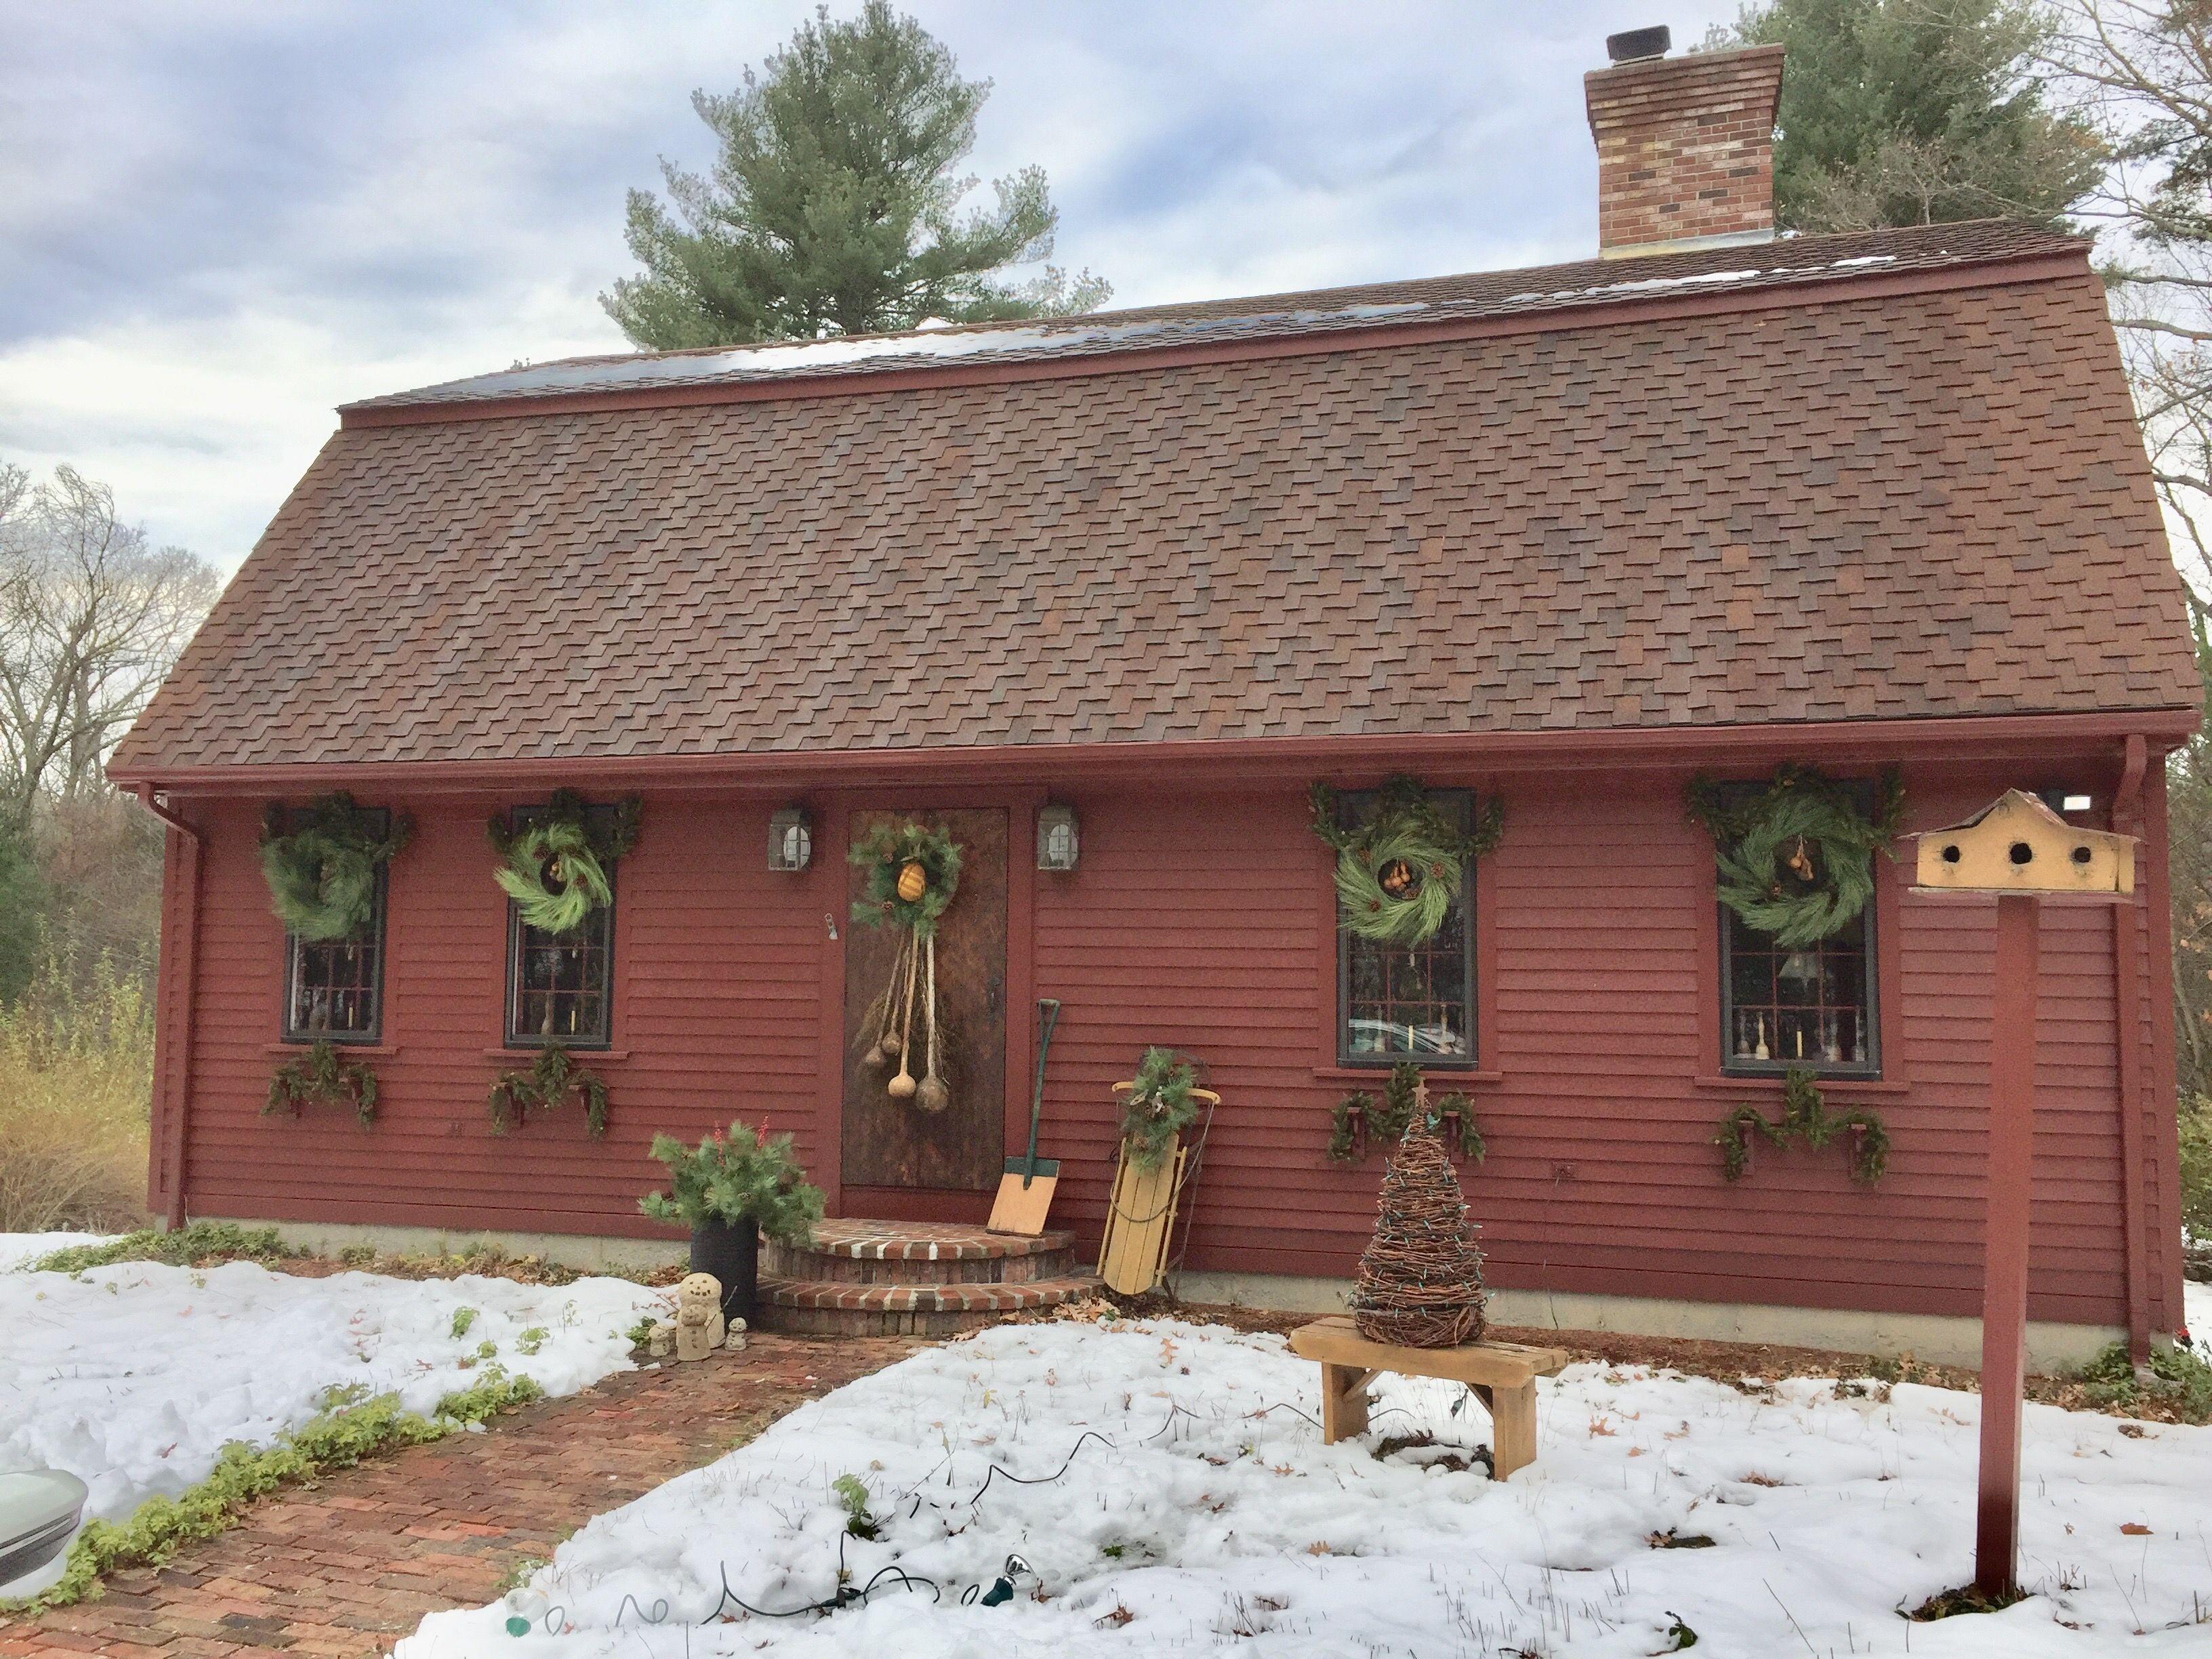 House Christmas Decoration House Designs Exterior House Exterior